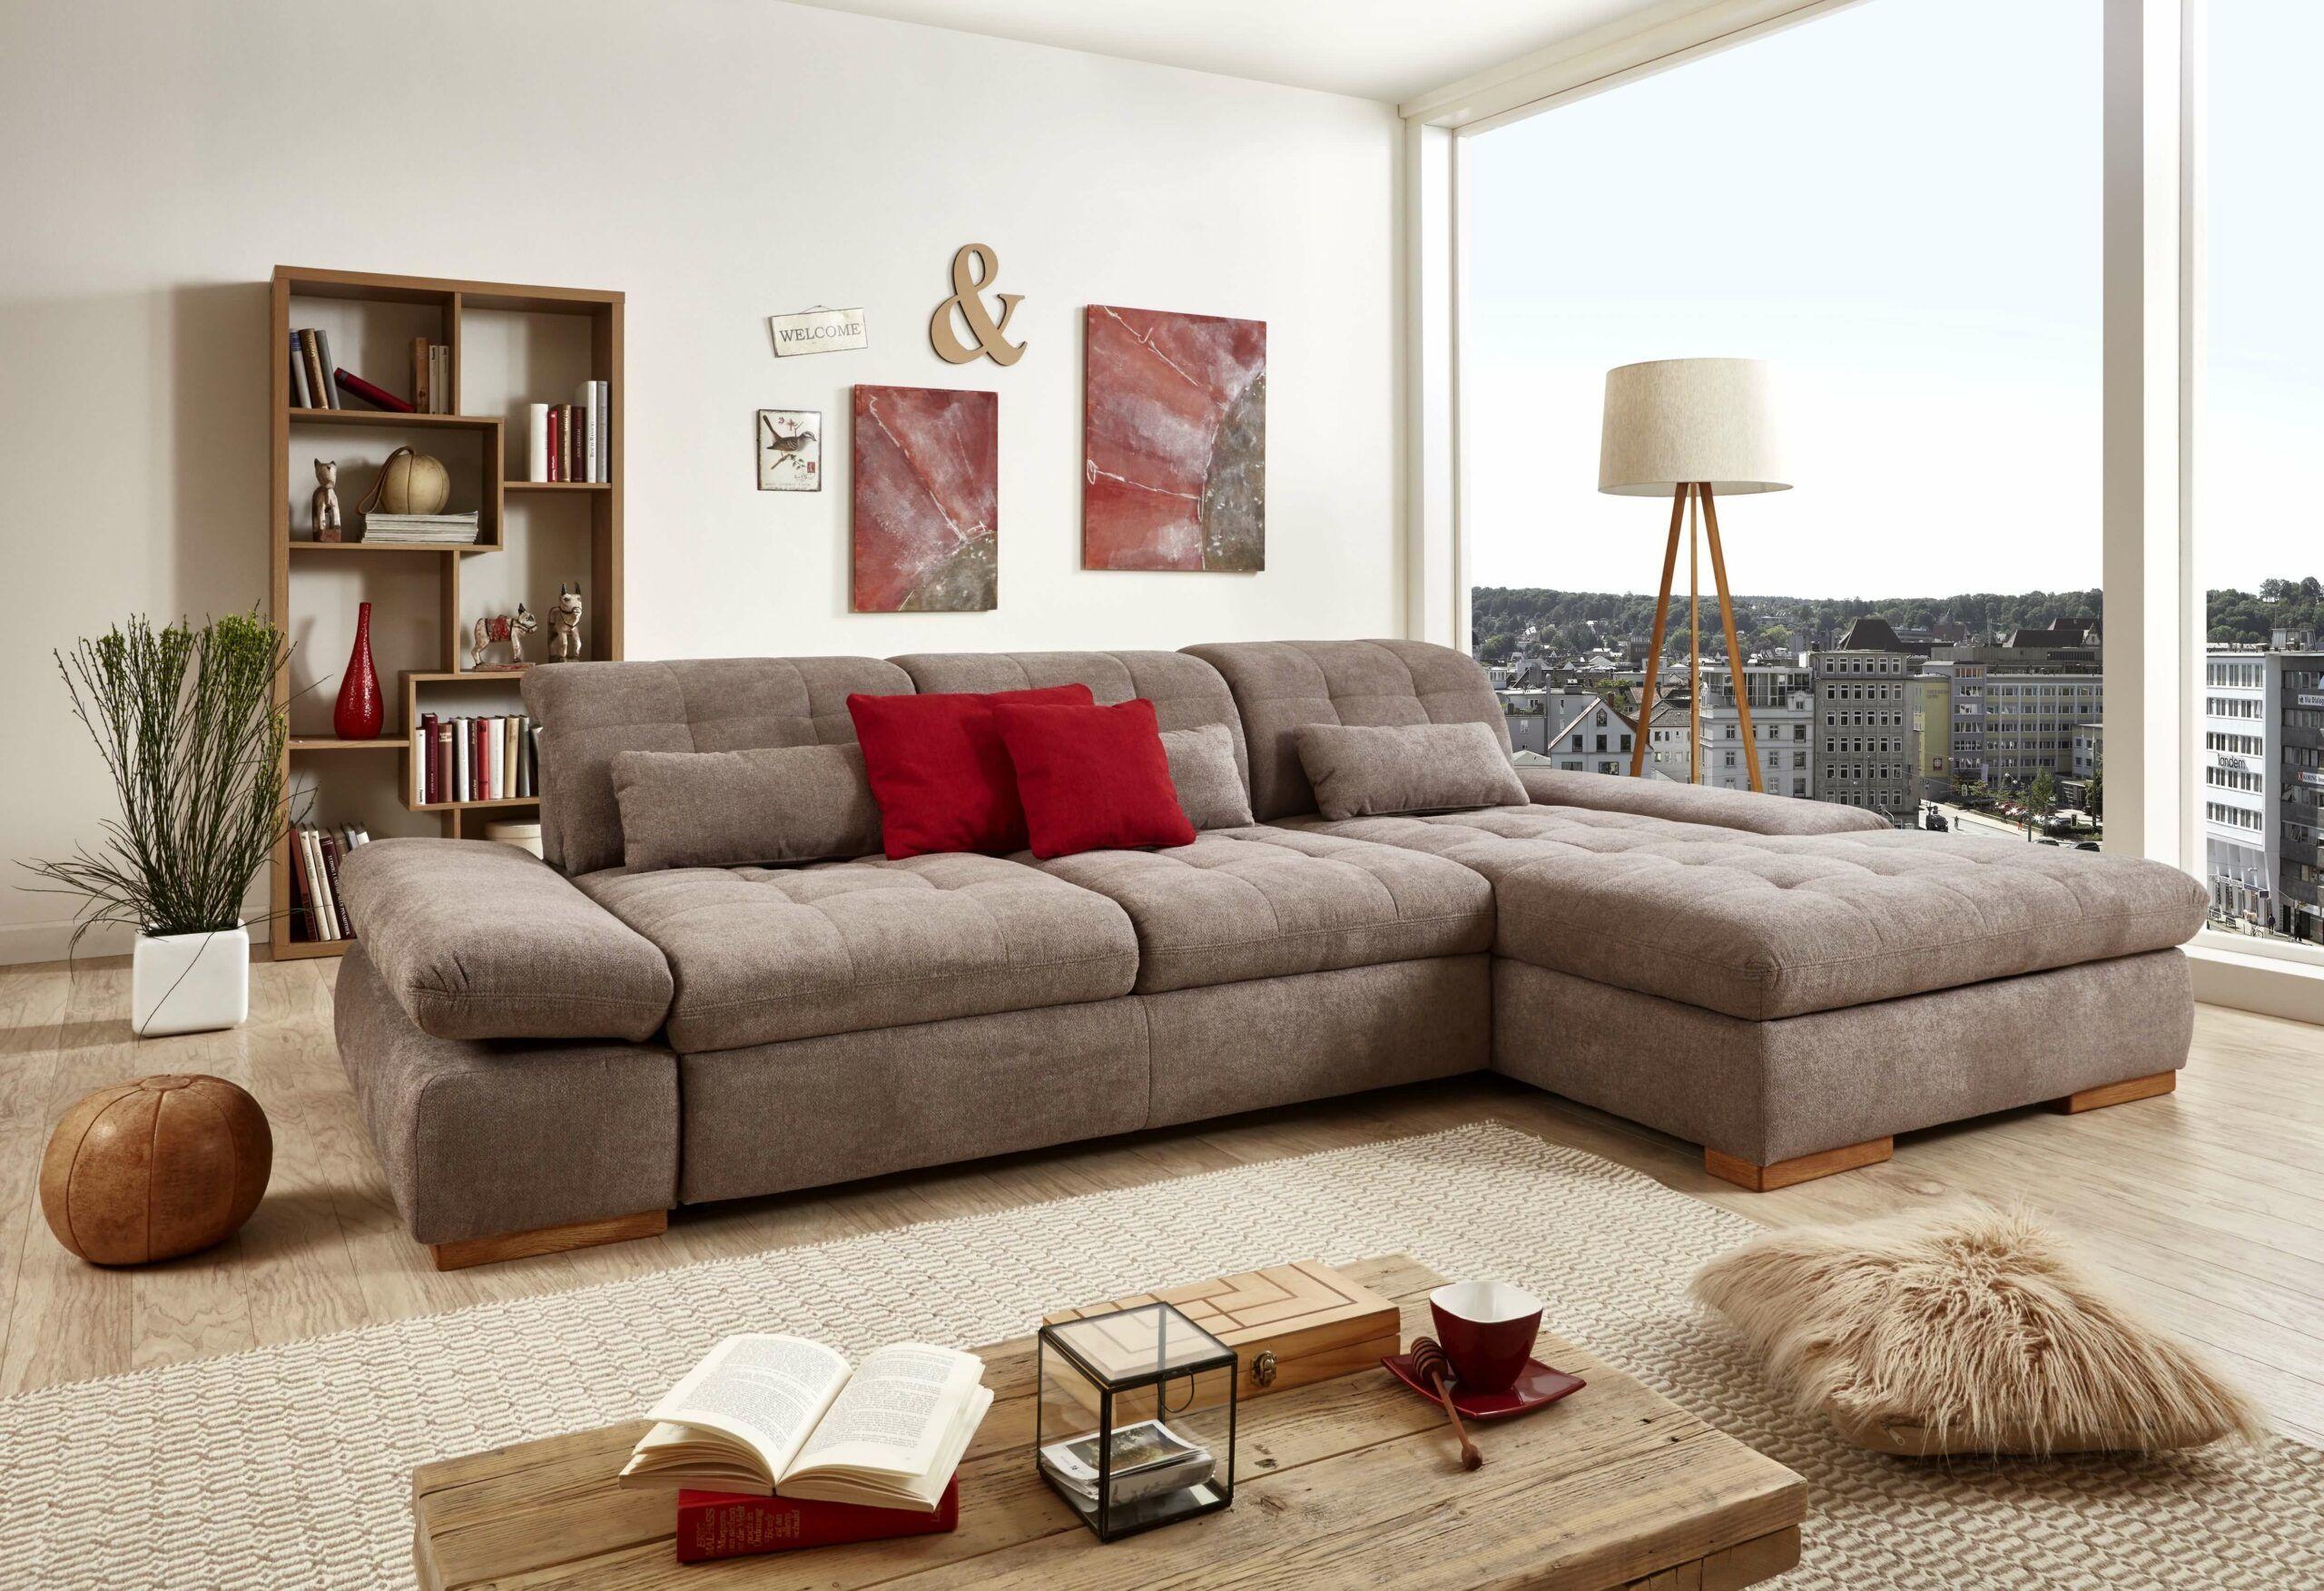 3 Couchgarnitur Wohnzimmer Home Decor Sectional Couch Furniture